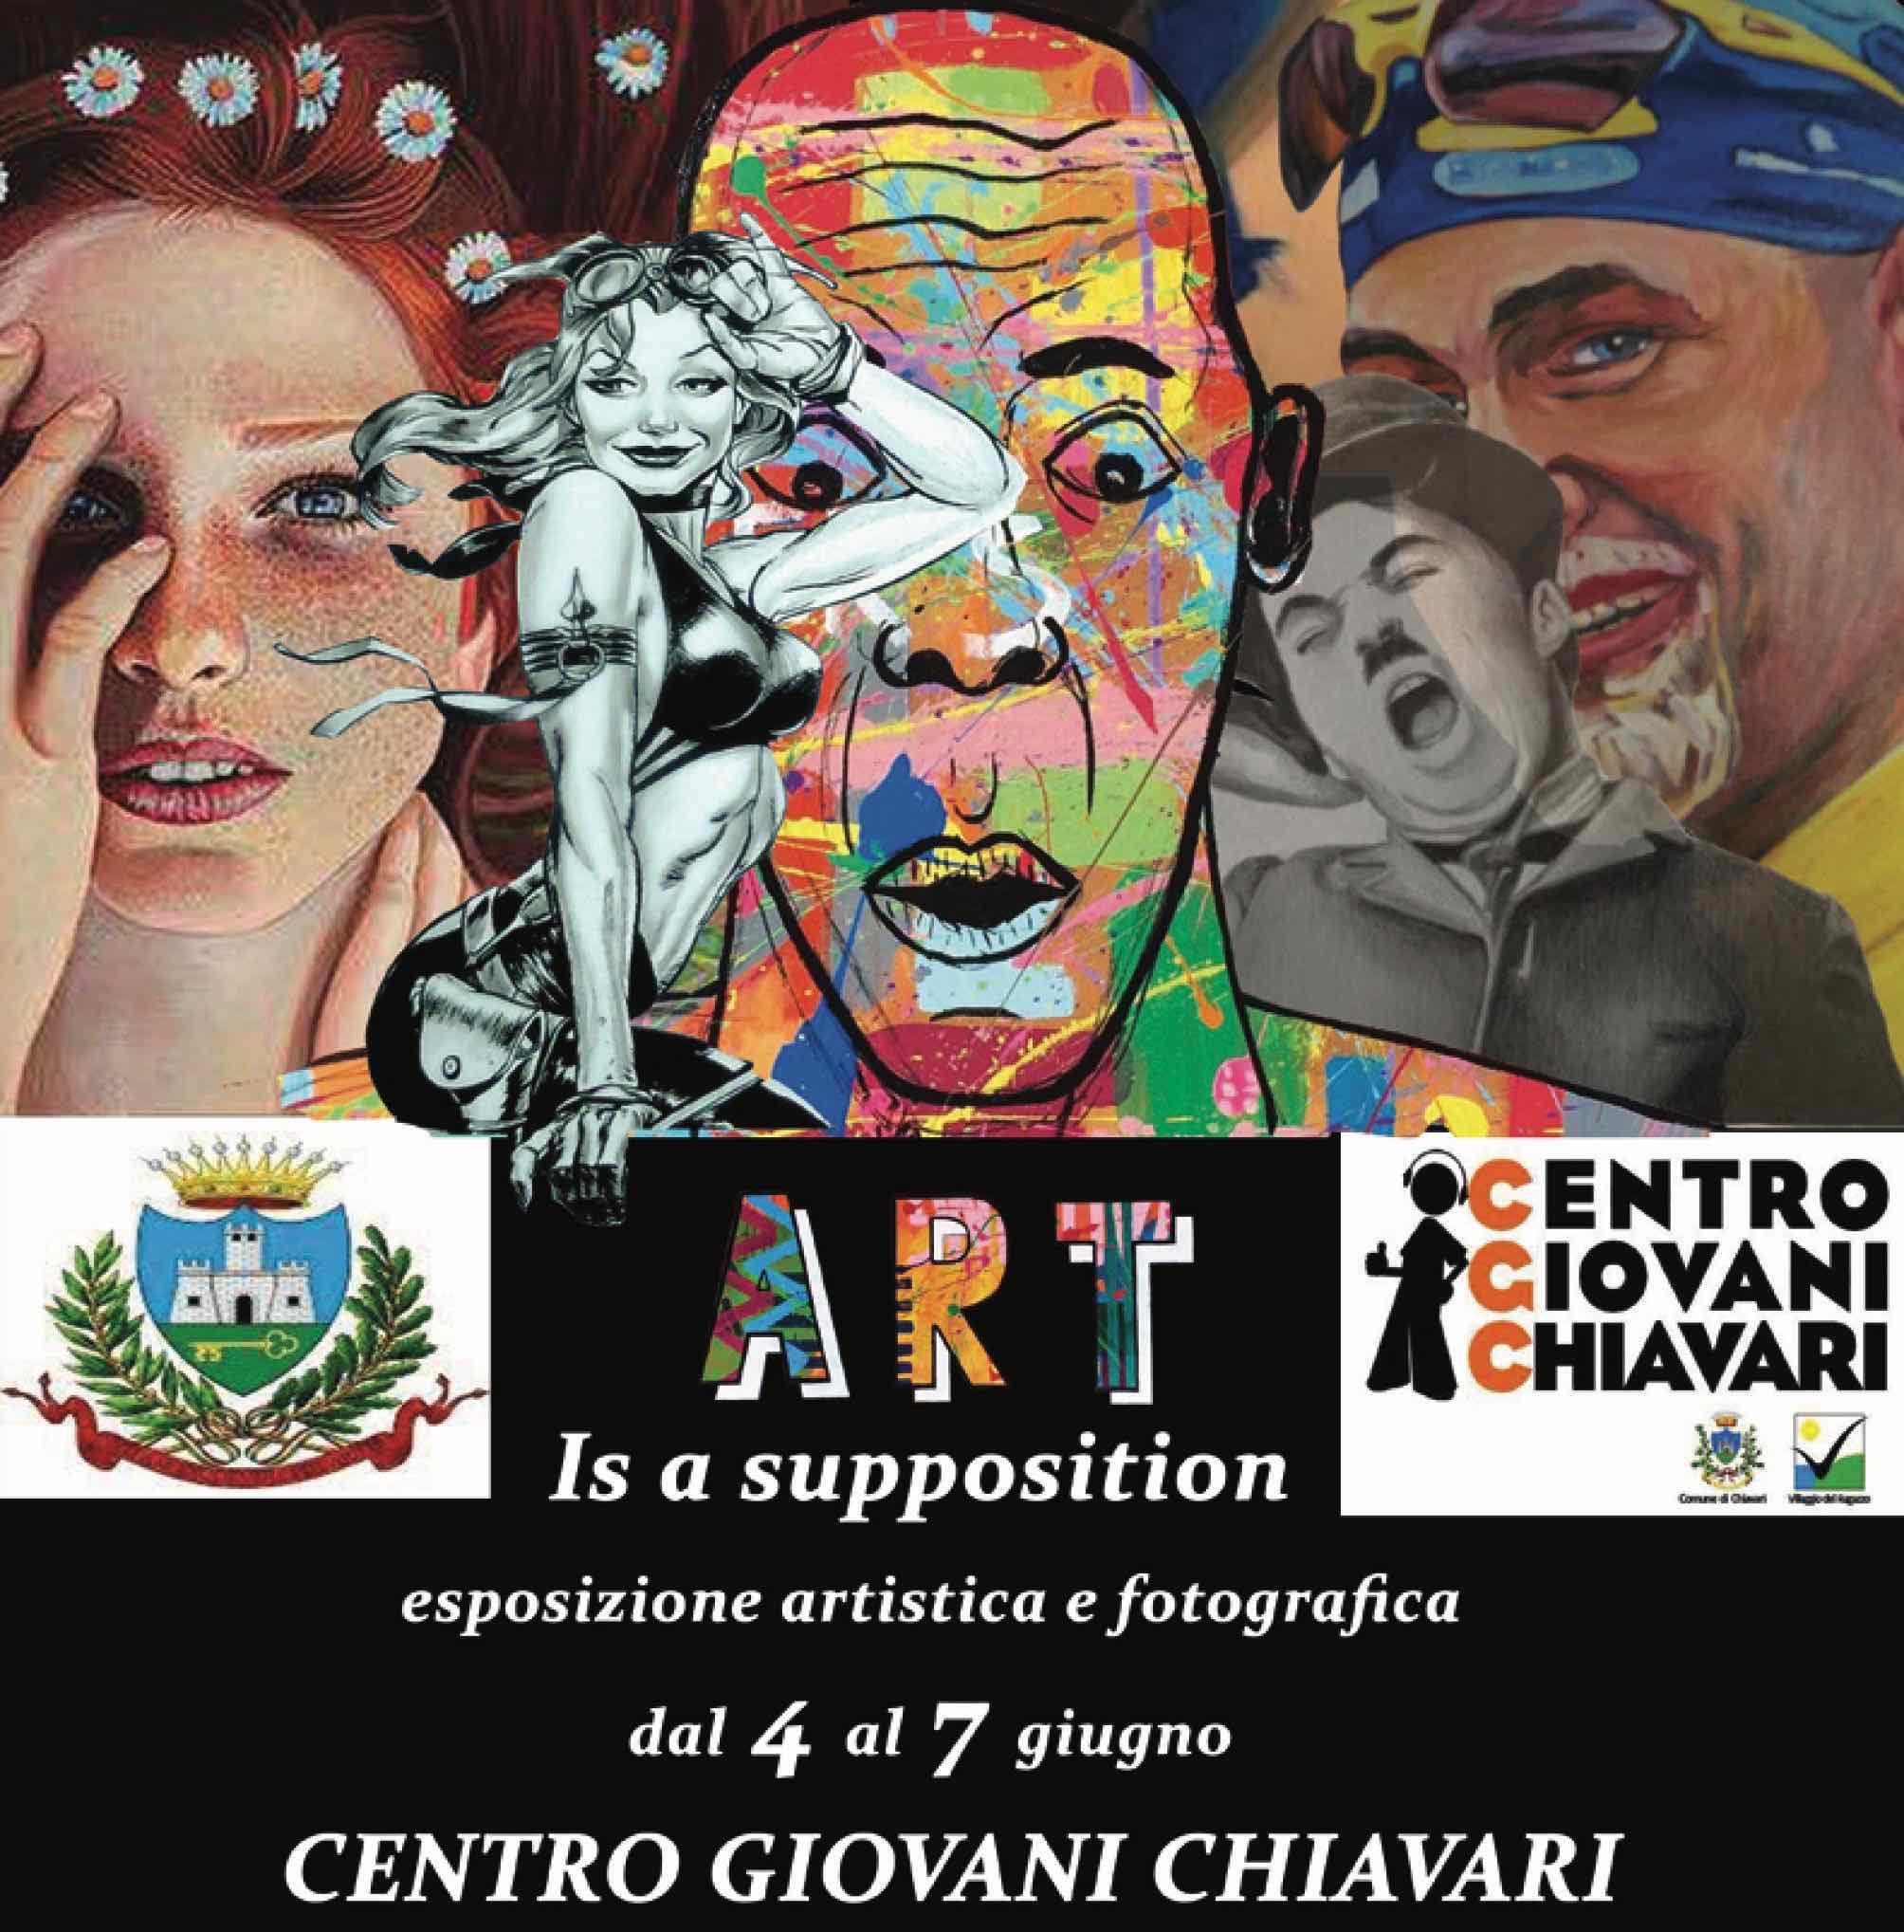 Centro Giovani Chiavari - Mostra Art is a supposition